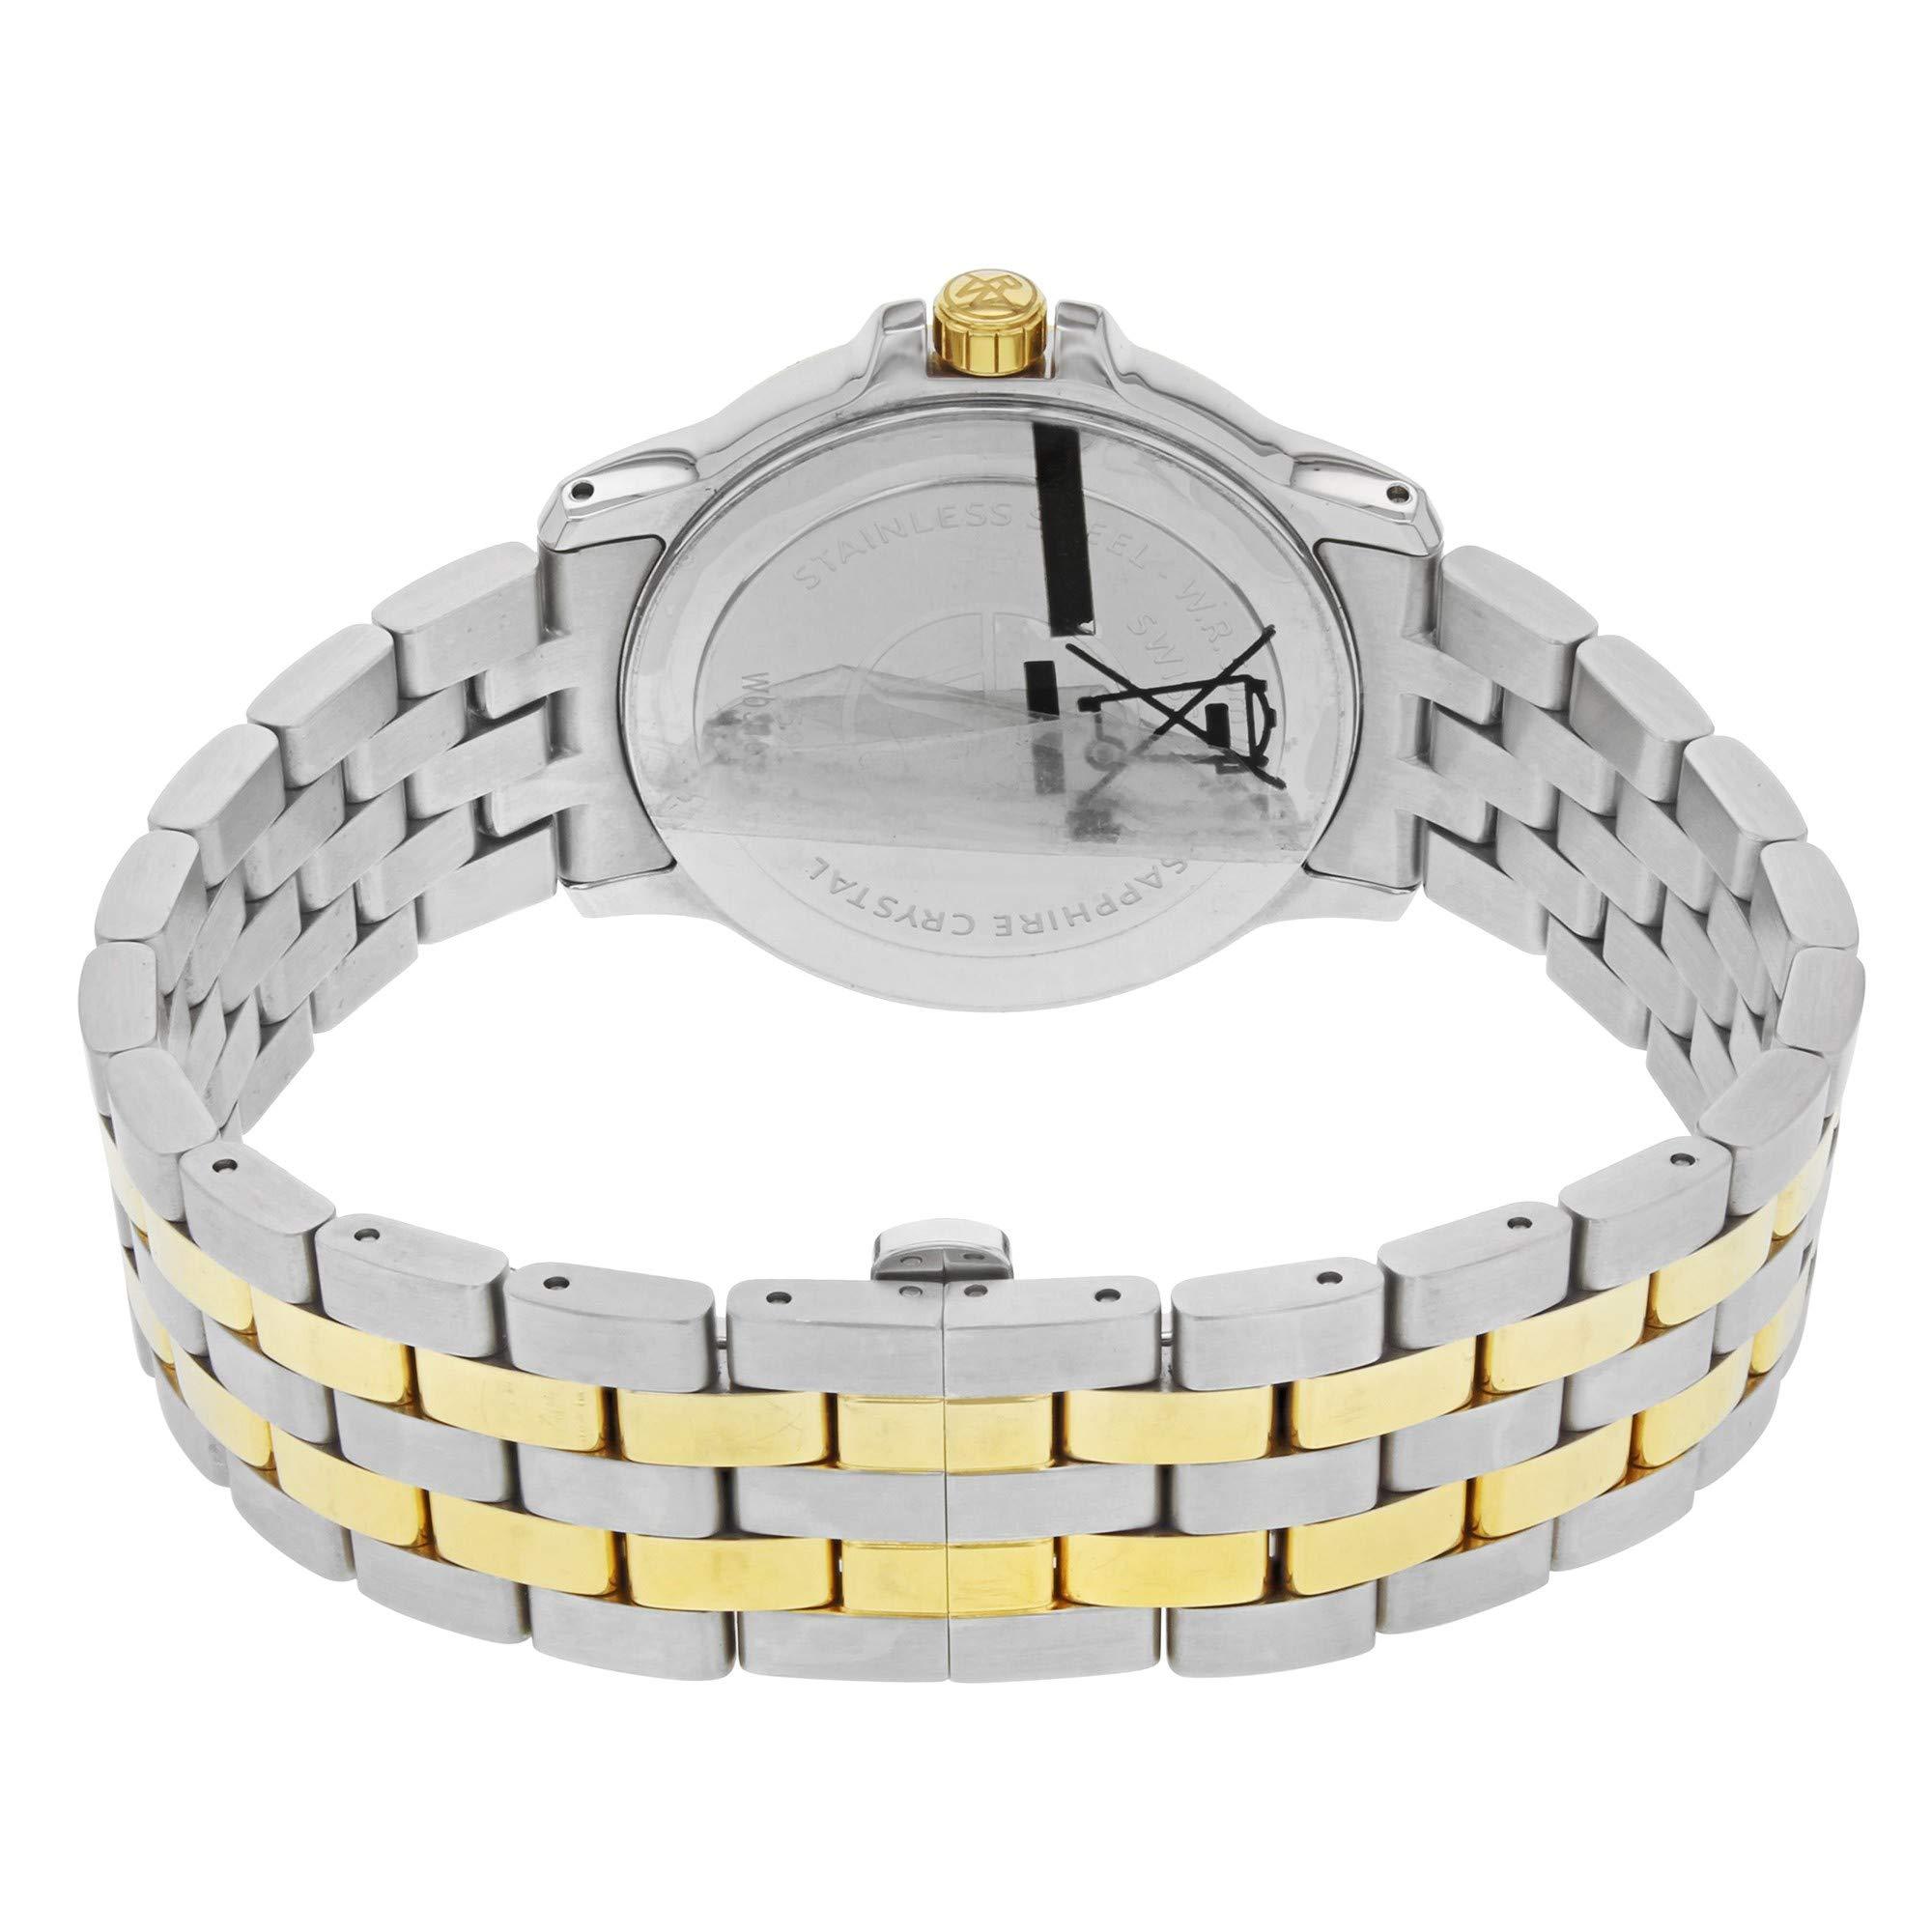 Raymond Weil Tango Quartz Male Watch 5599-STP-00308 (Certified Pre-Owned) by RAYMOND WEIL (Image #2)